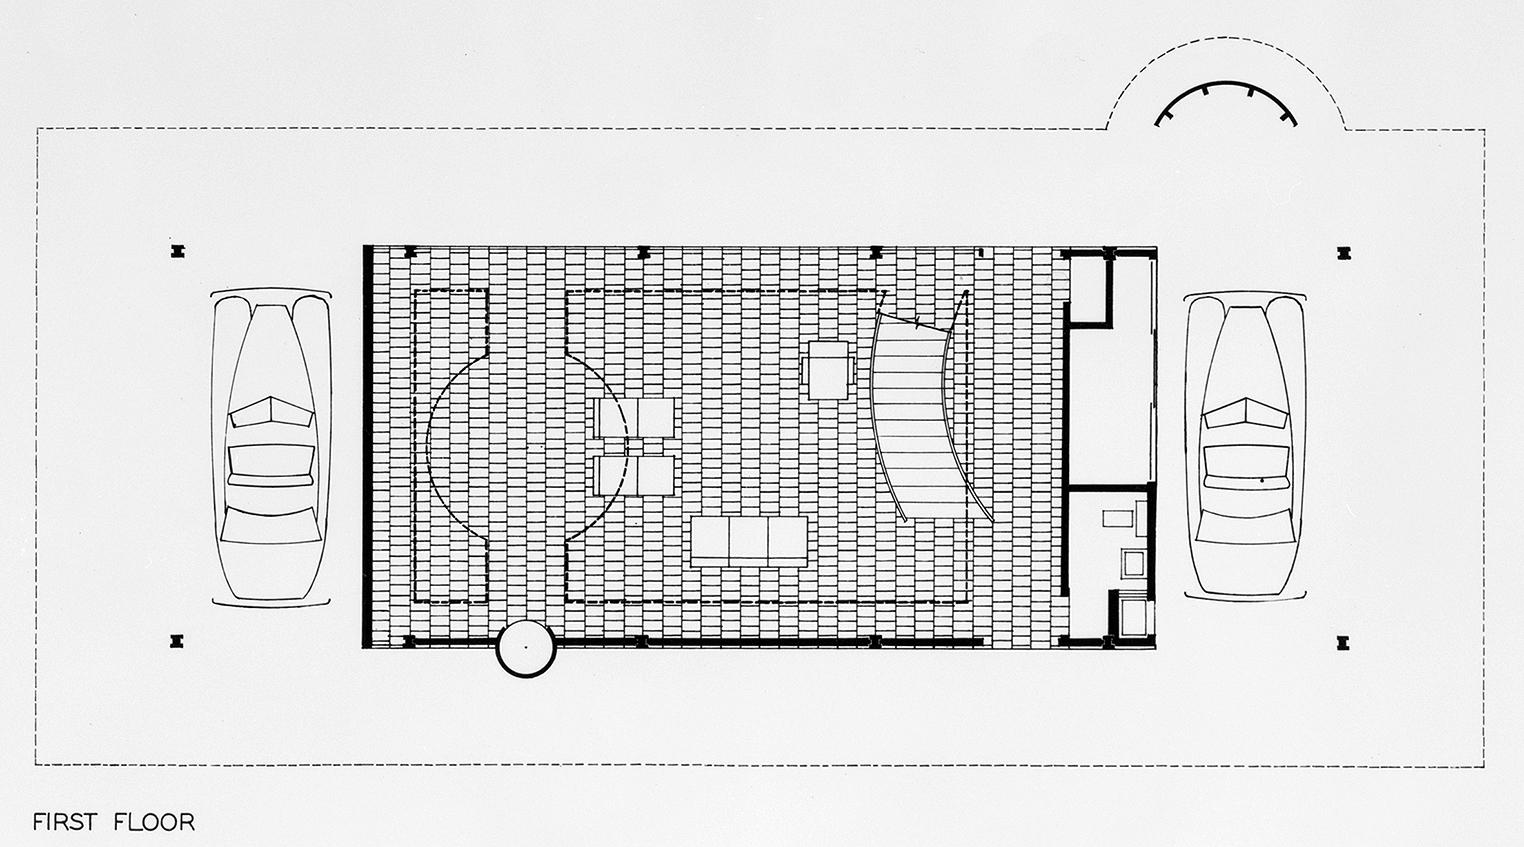 Cohen residence, Siesta Key, Florida. First Scheme. Second Floor Plan.